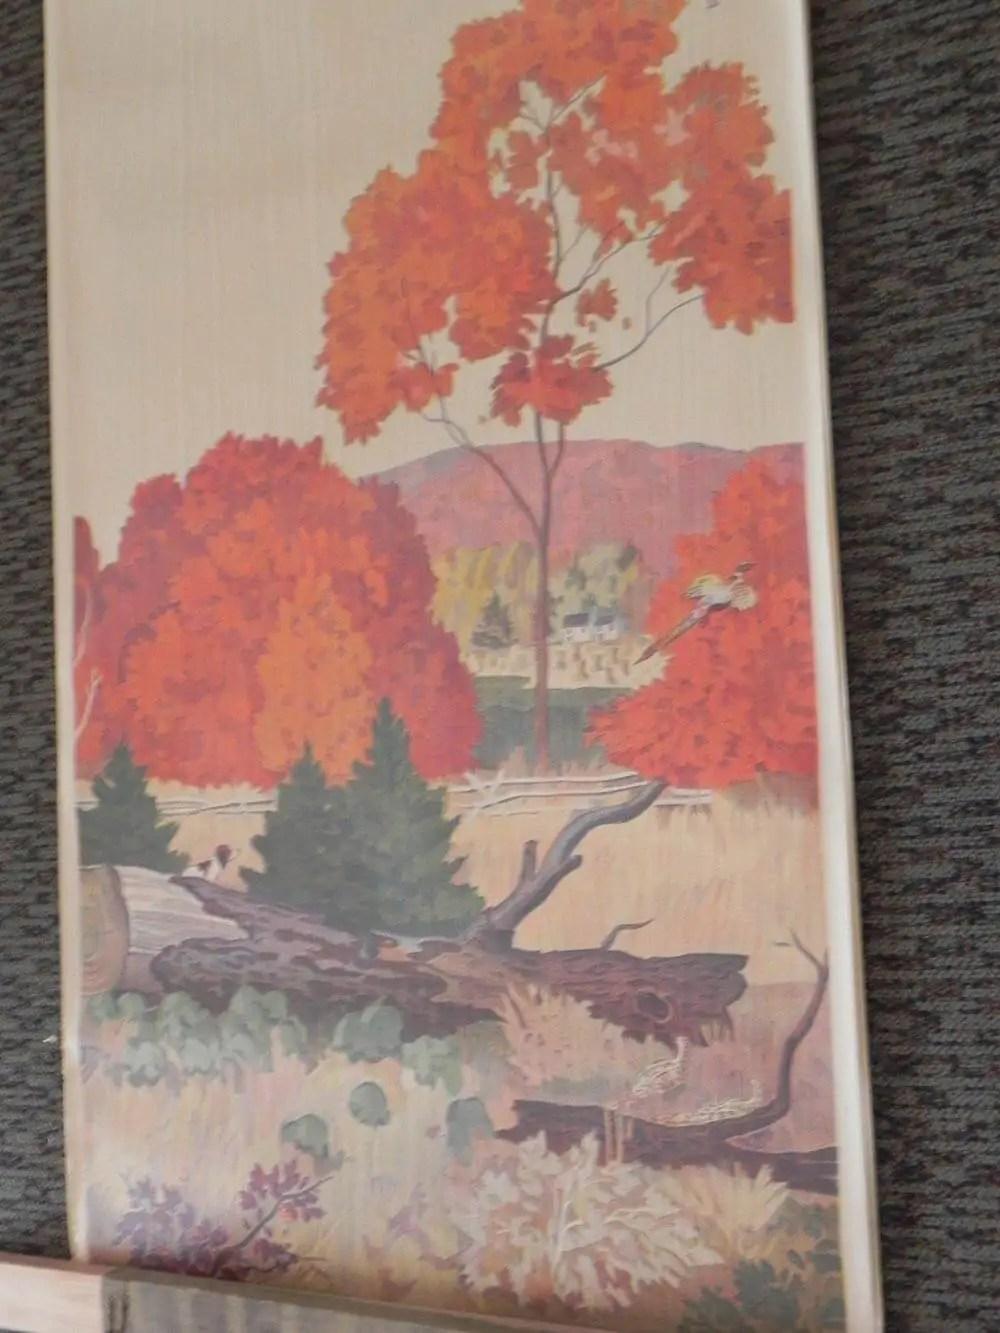 Early Fall Wallpaper Full Room Vintage Wallpaper Murals By The Schmitz Horning